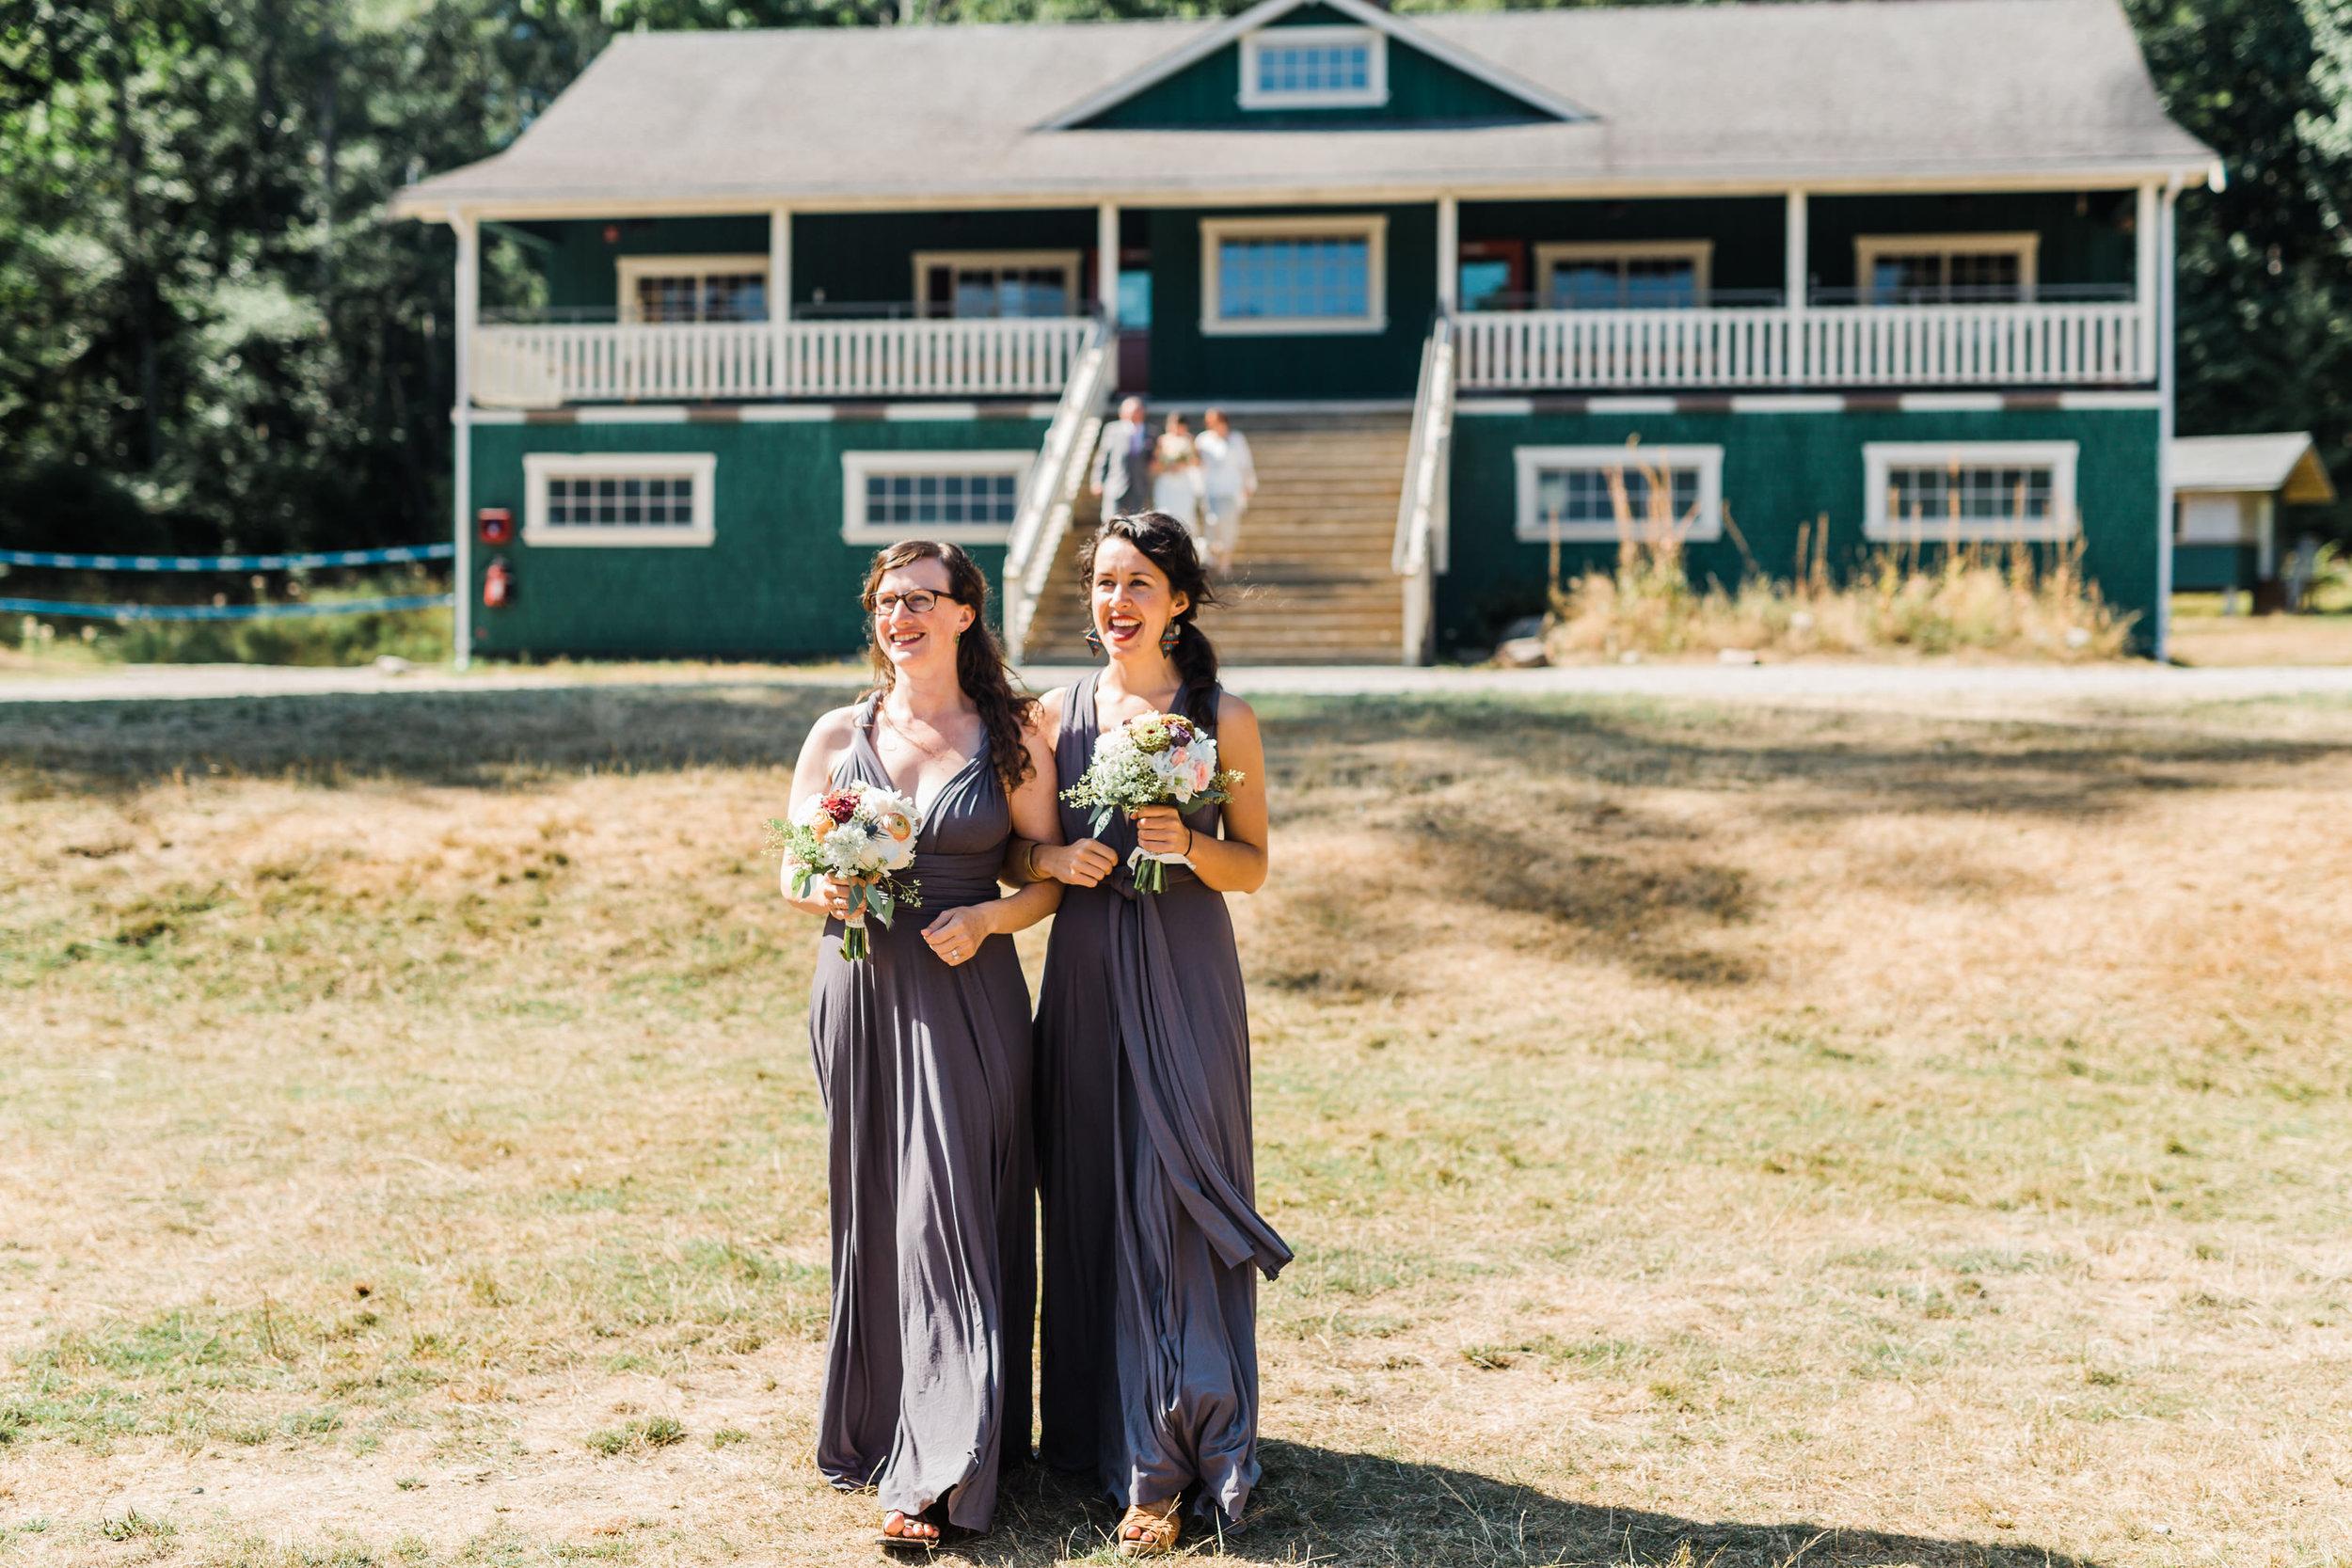 Camp Fircom Wedding - Vancouver Wedding Photographer & Videographer - Sunshine Coast Wedding Photos - Sunshine Coast Wedding Photographer - Jennifer Picard Photography - IMG_0563.jpg